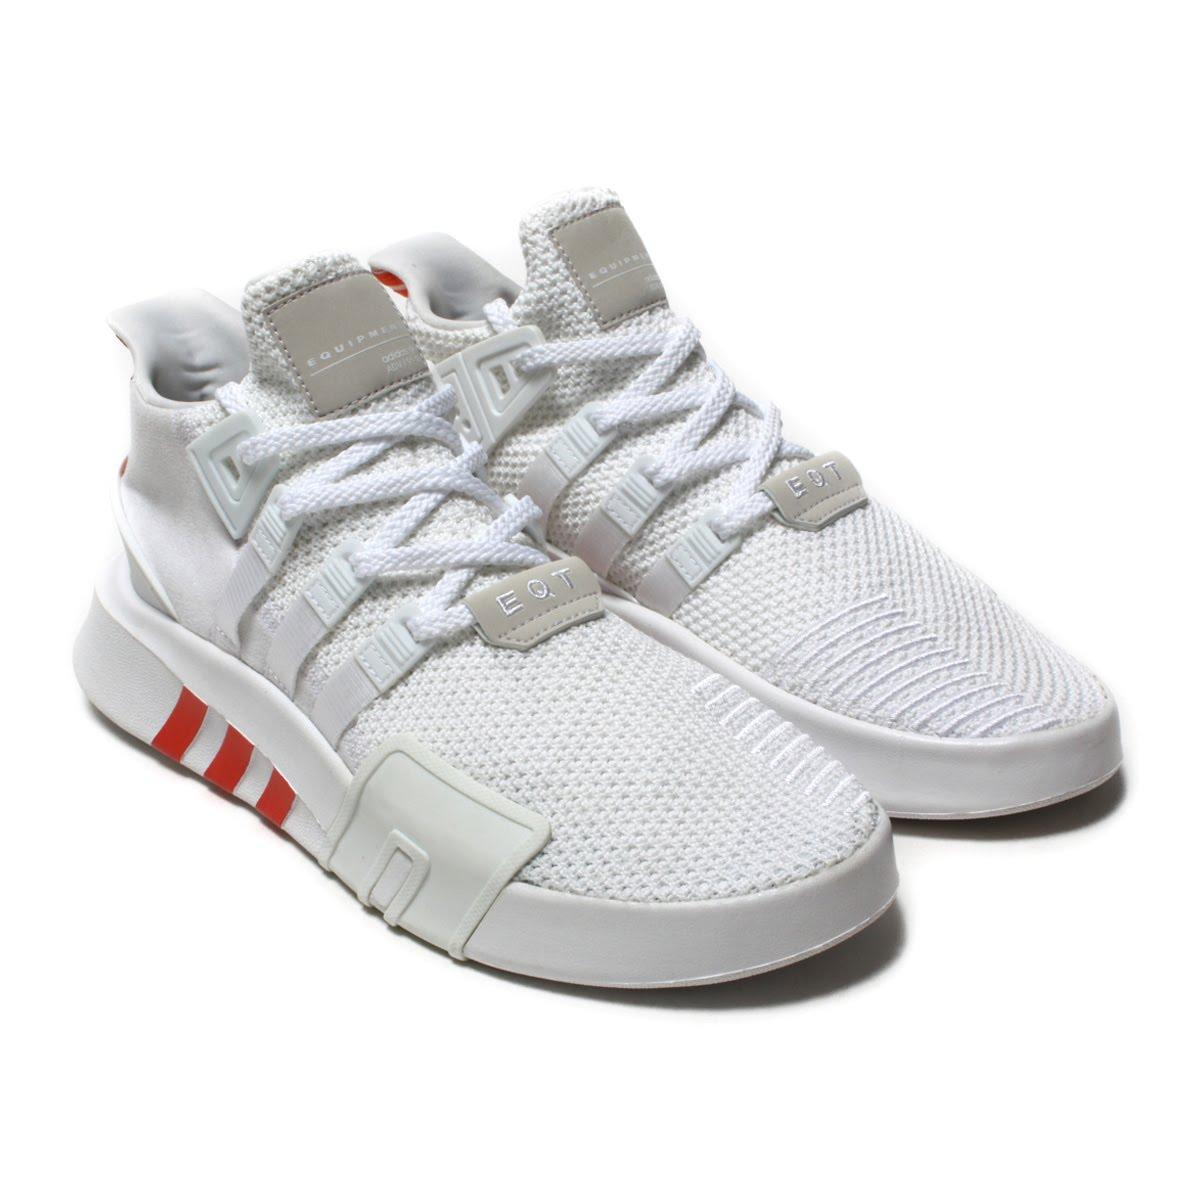 adidas Originals EQT BASK ADV(アディダス オリジナルス イーキューティー BASK ADV)Running White/Running White/Trase Scarlet【メンズ スニーカー】18SS-I